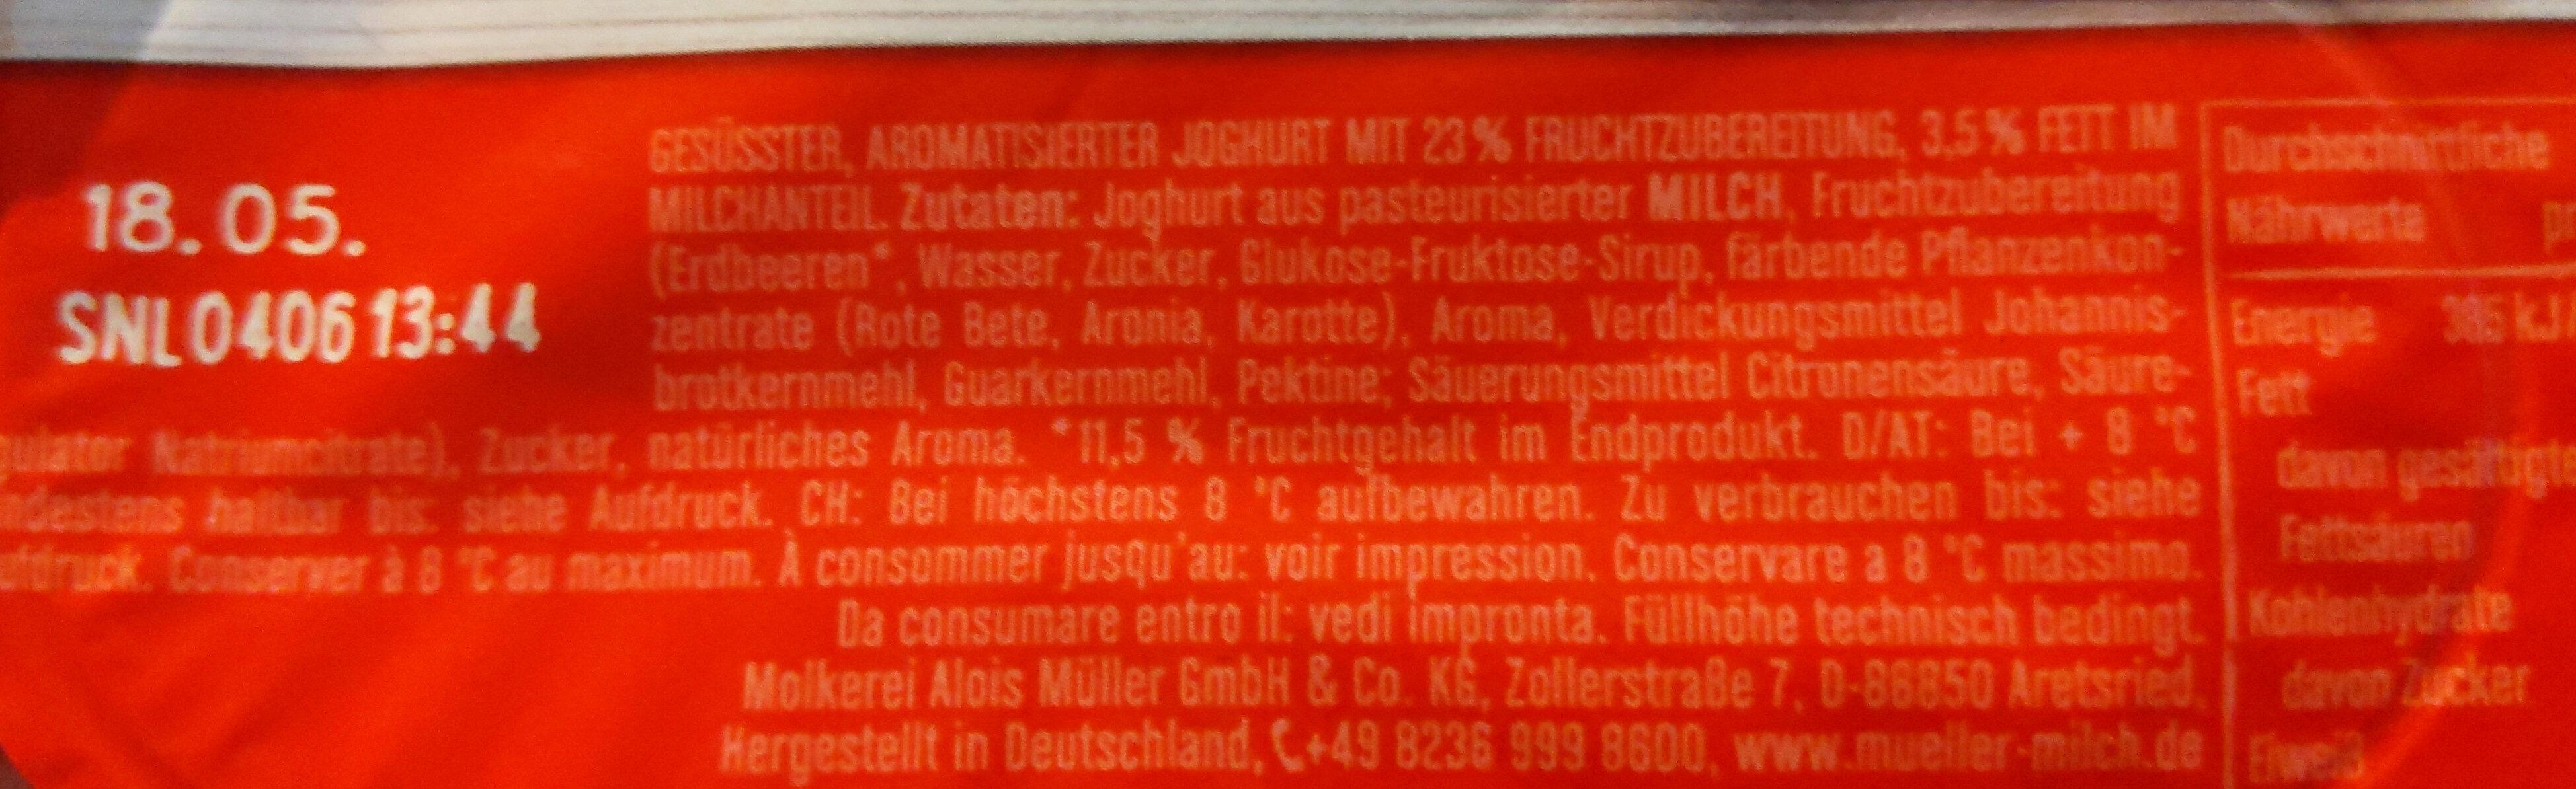 Joghurt mit der Ecke, Erdbeere - Ingrédients - de